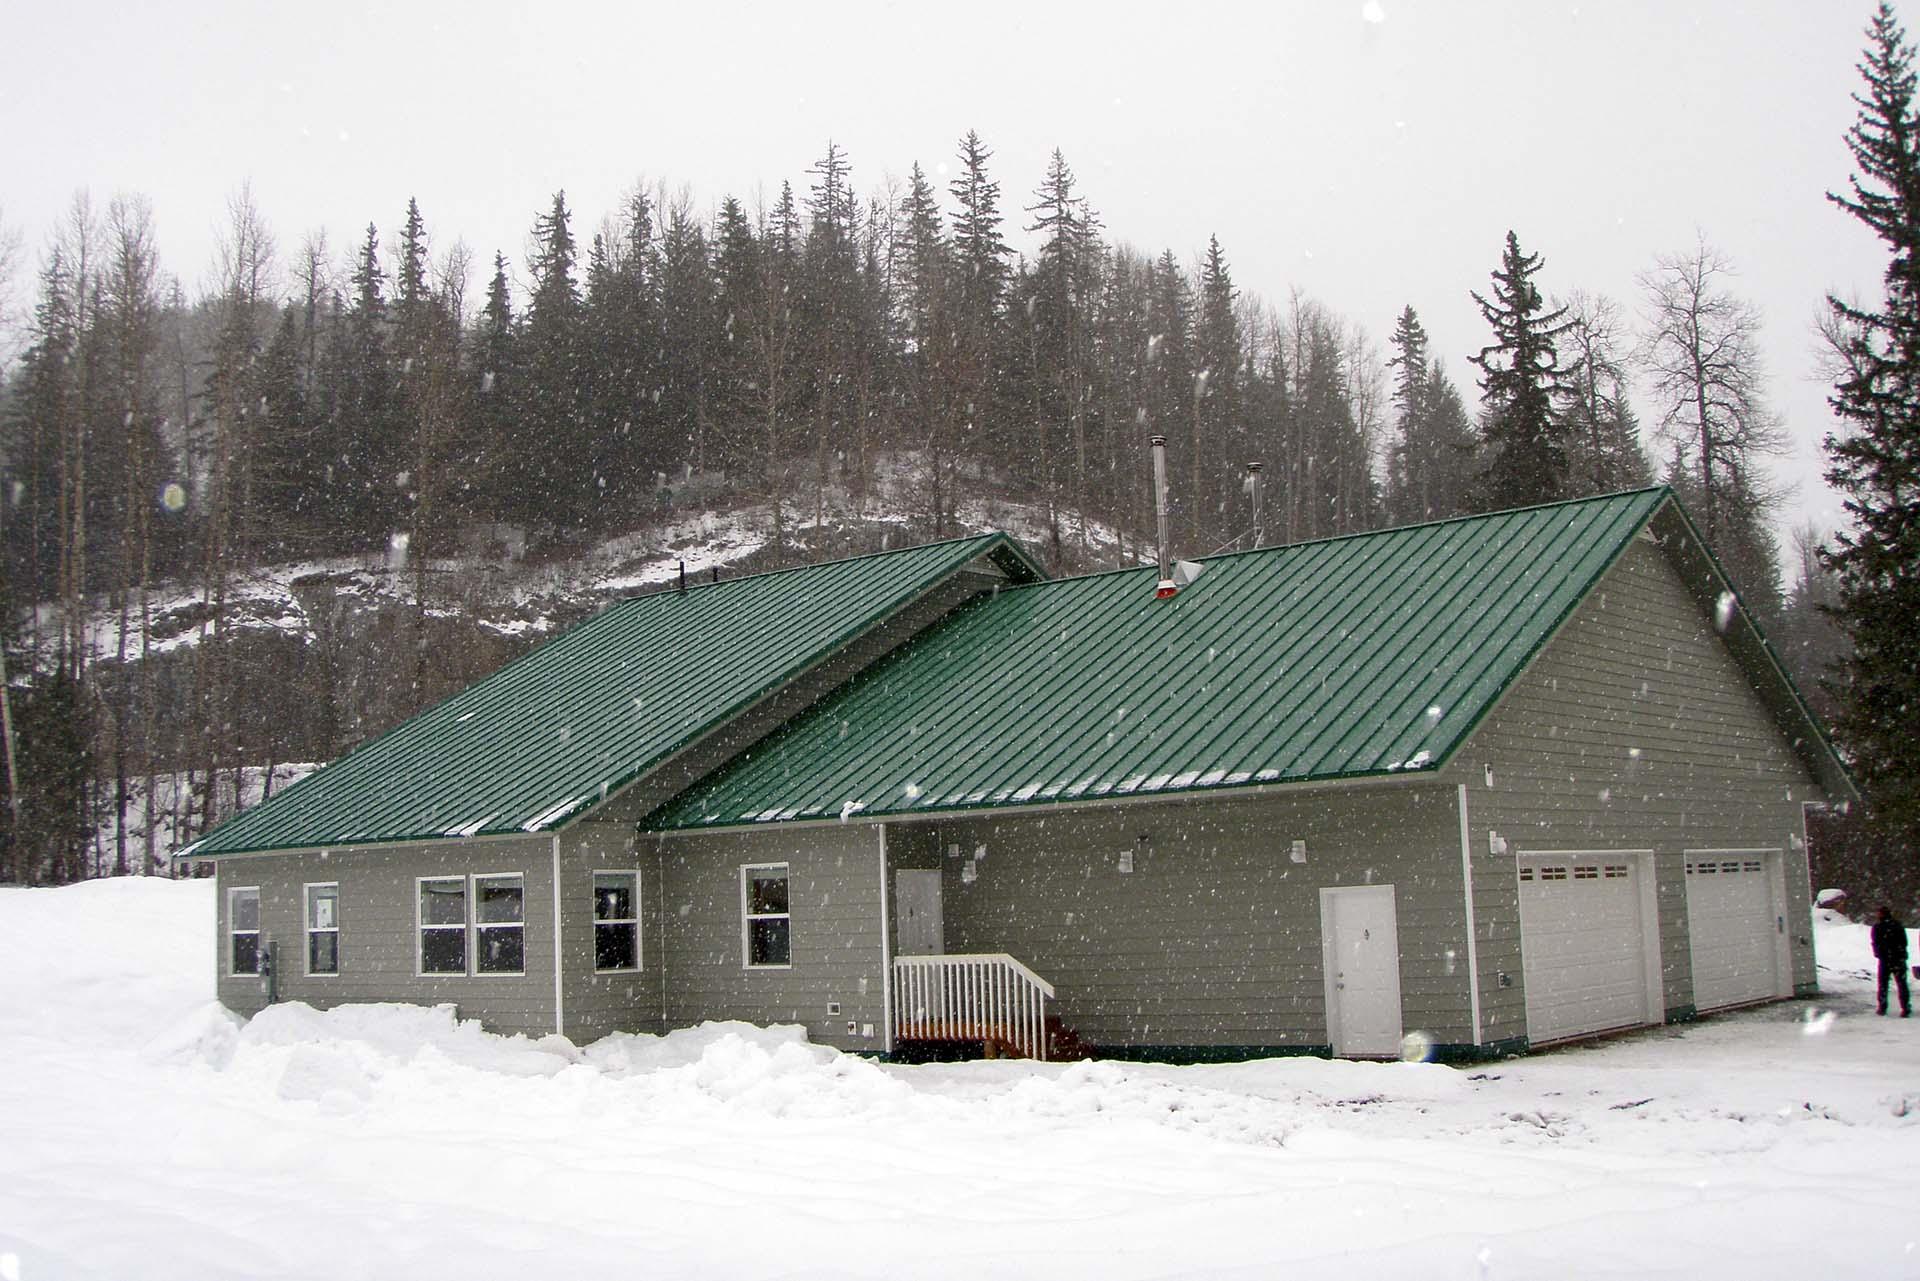 Craftsman Homes - Dalton Cache - Haines, Alaska